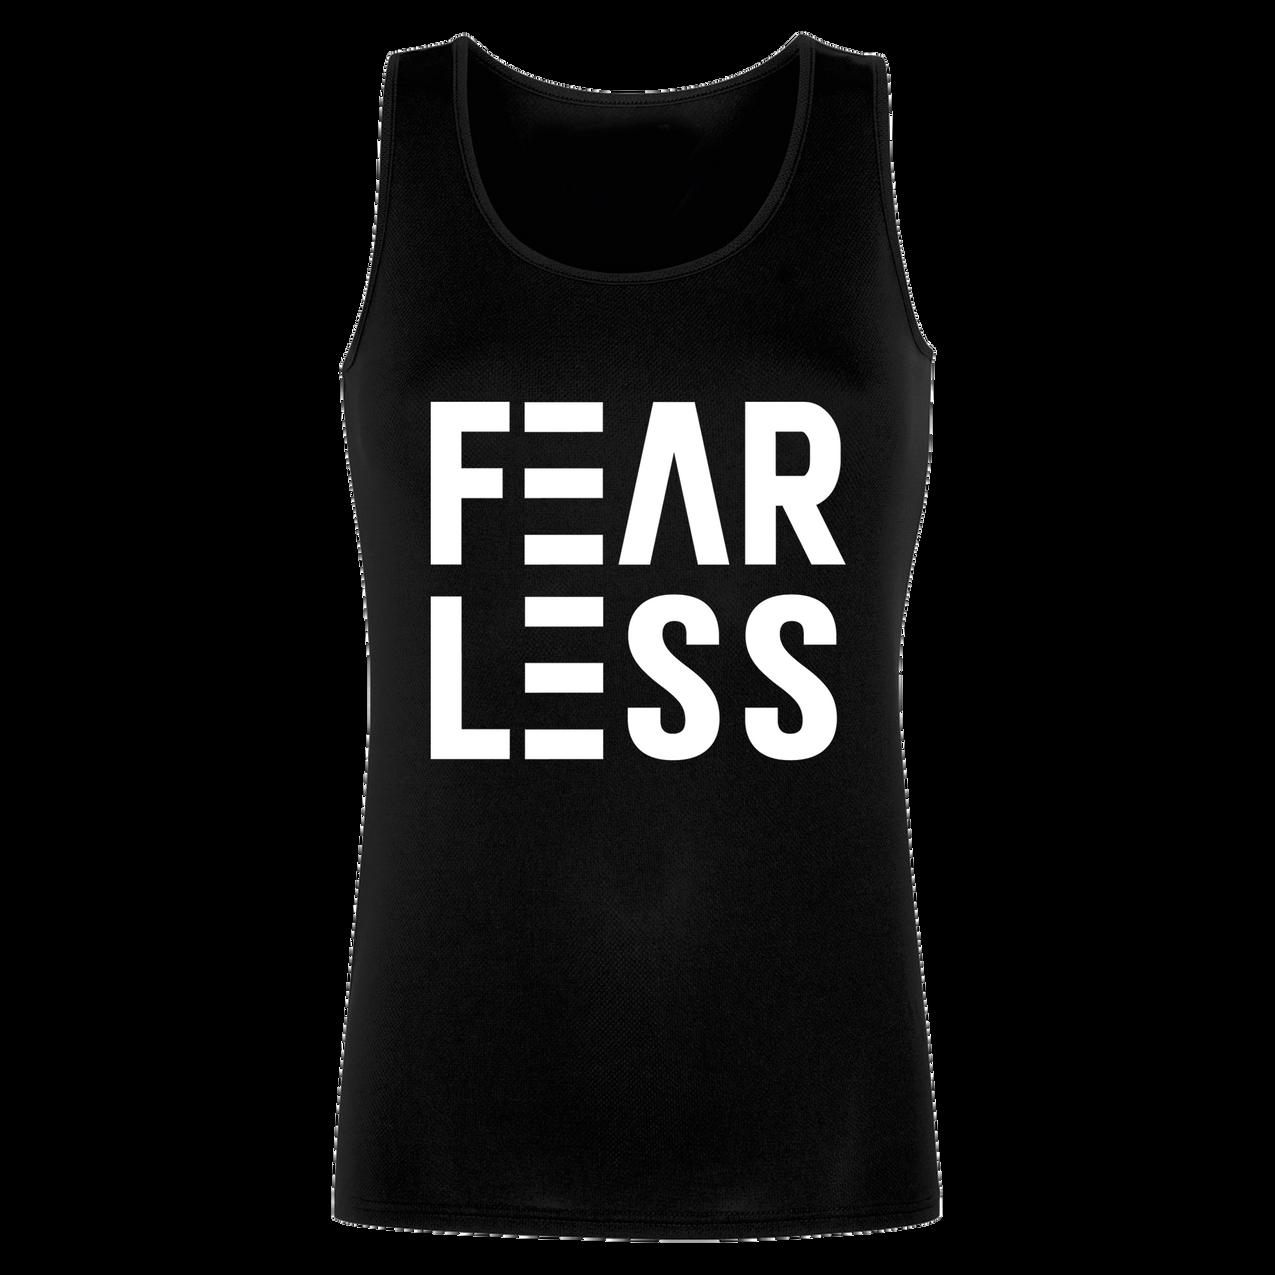 Fearless (W)